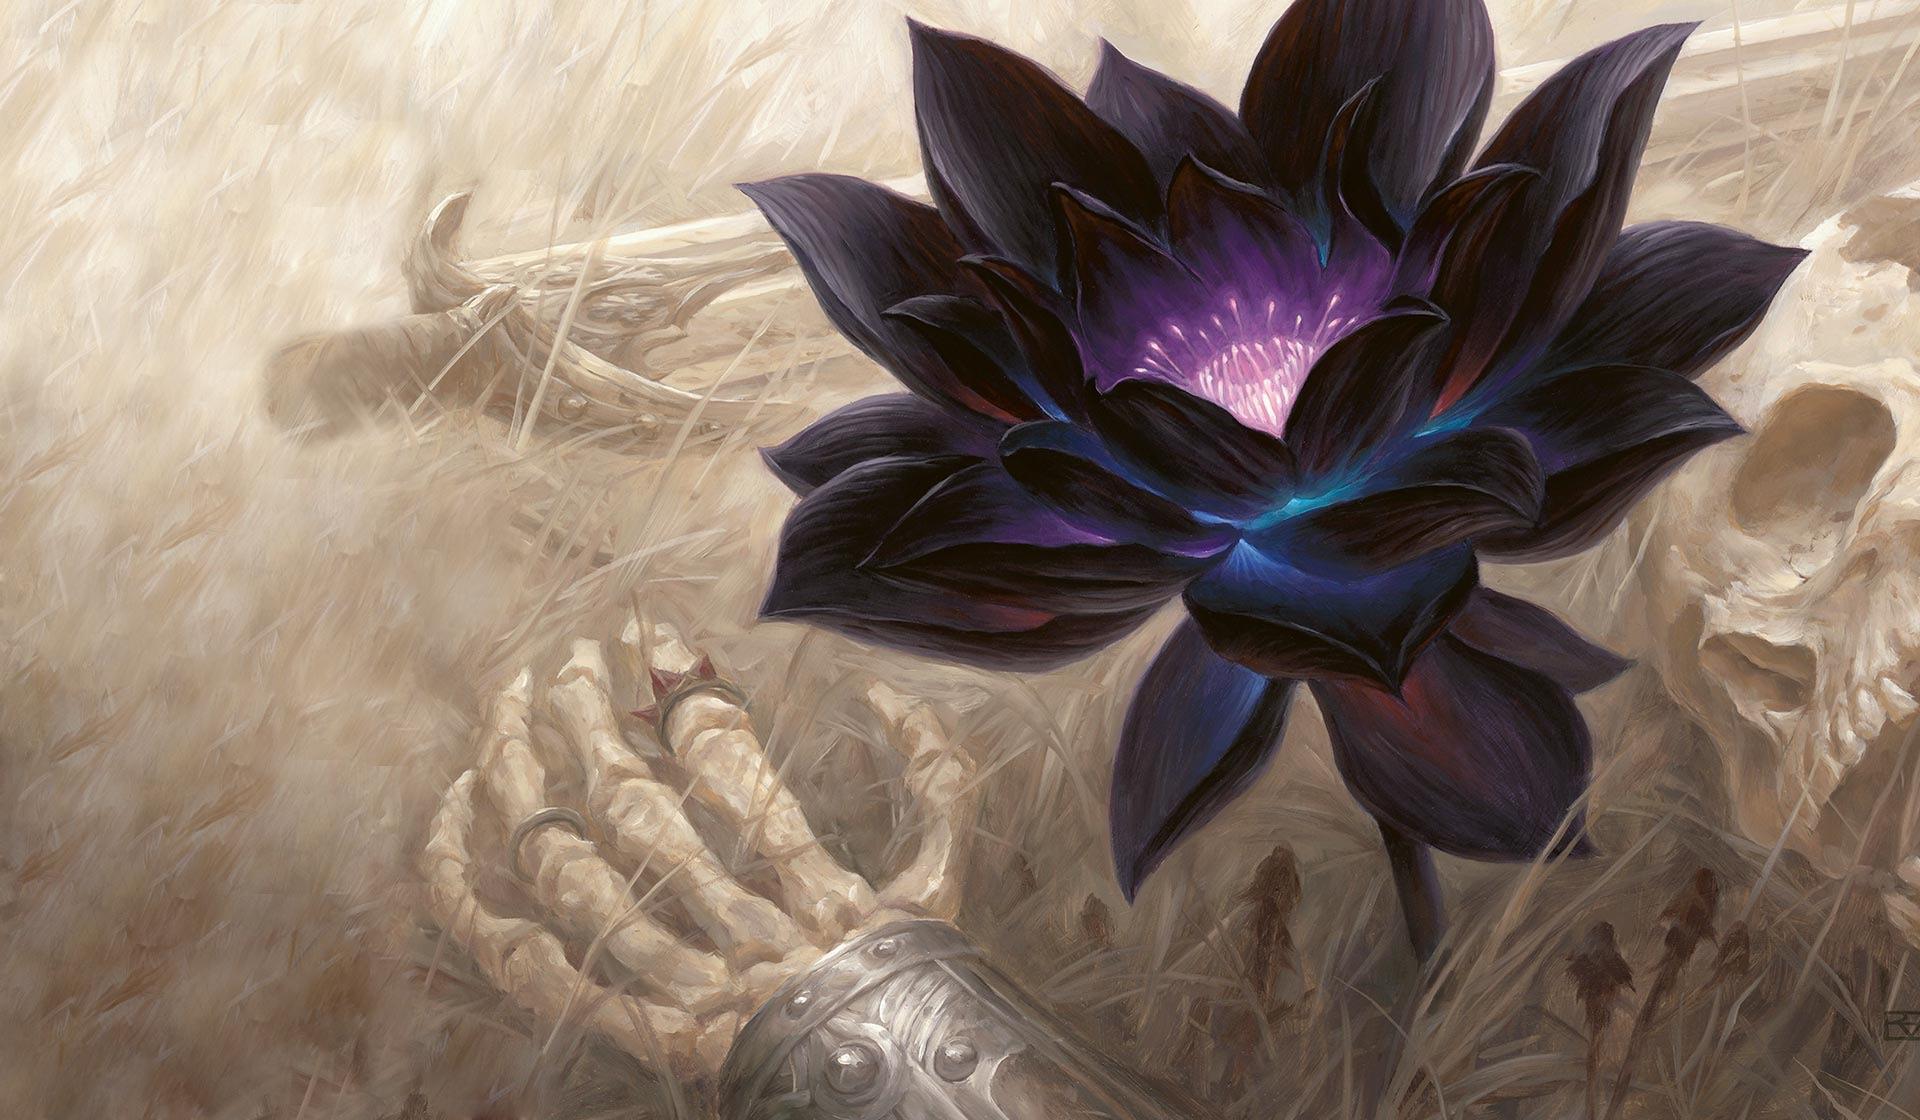 Black Lotus Wallpapers Top Free Black Lotus Backgrounds Wallpaperaccess